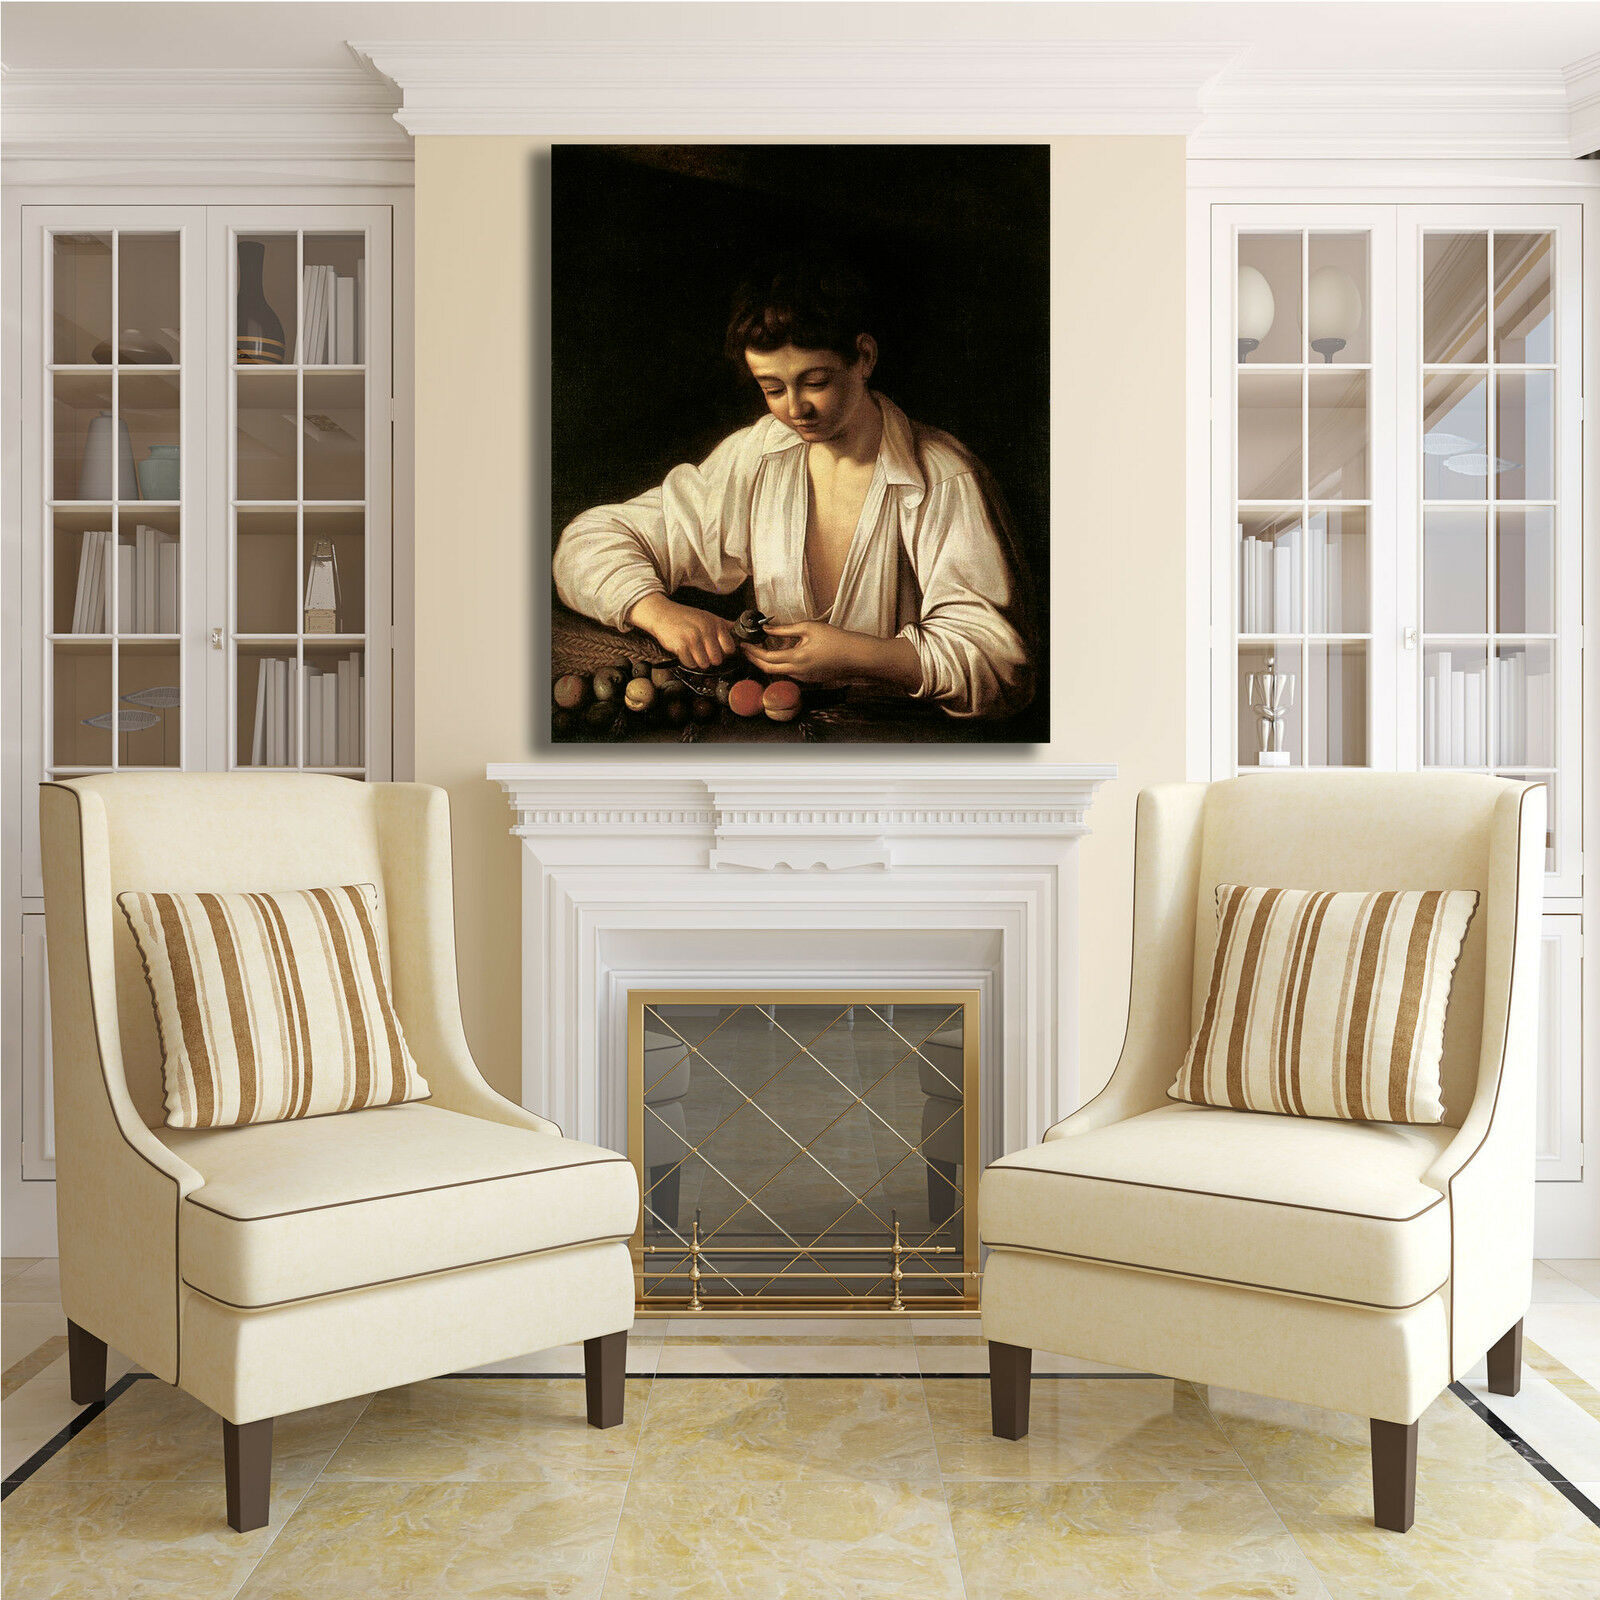 Caravaggio ragazzo monda monda monda frutto quadro stampa tela dipinto telaio arRouge o casa 5abee2